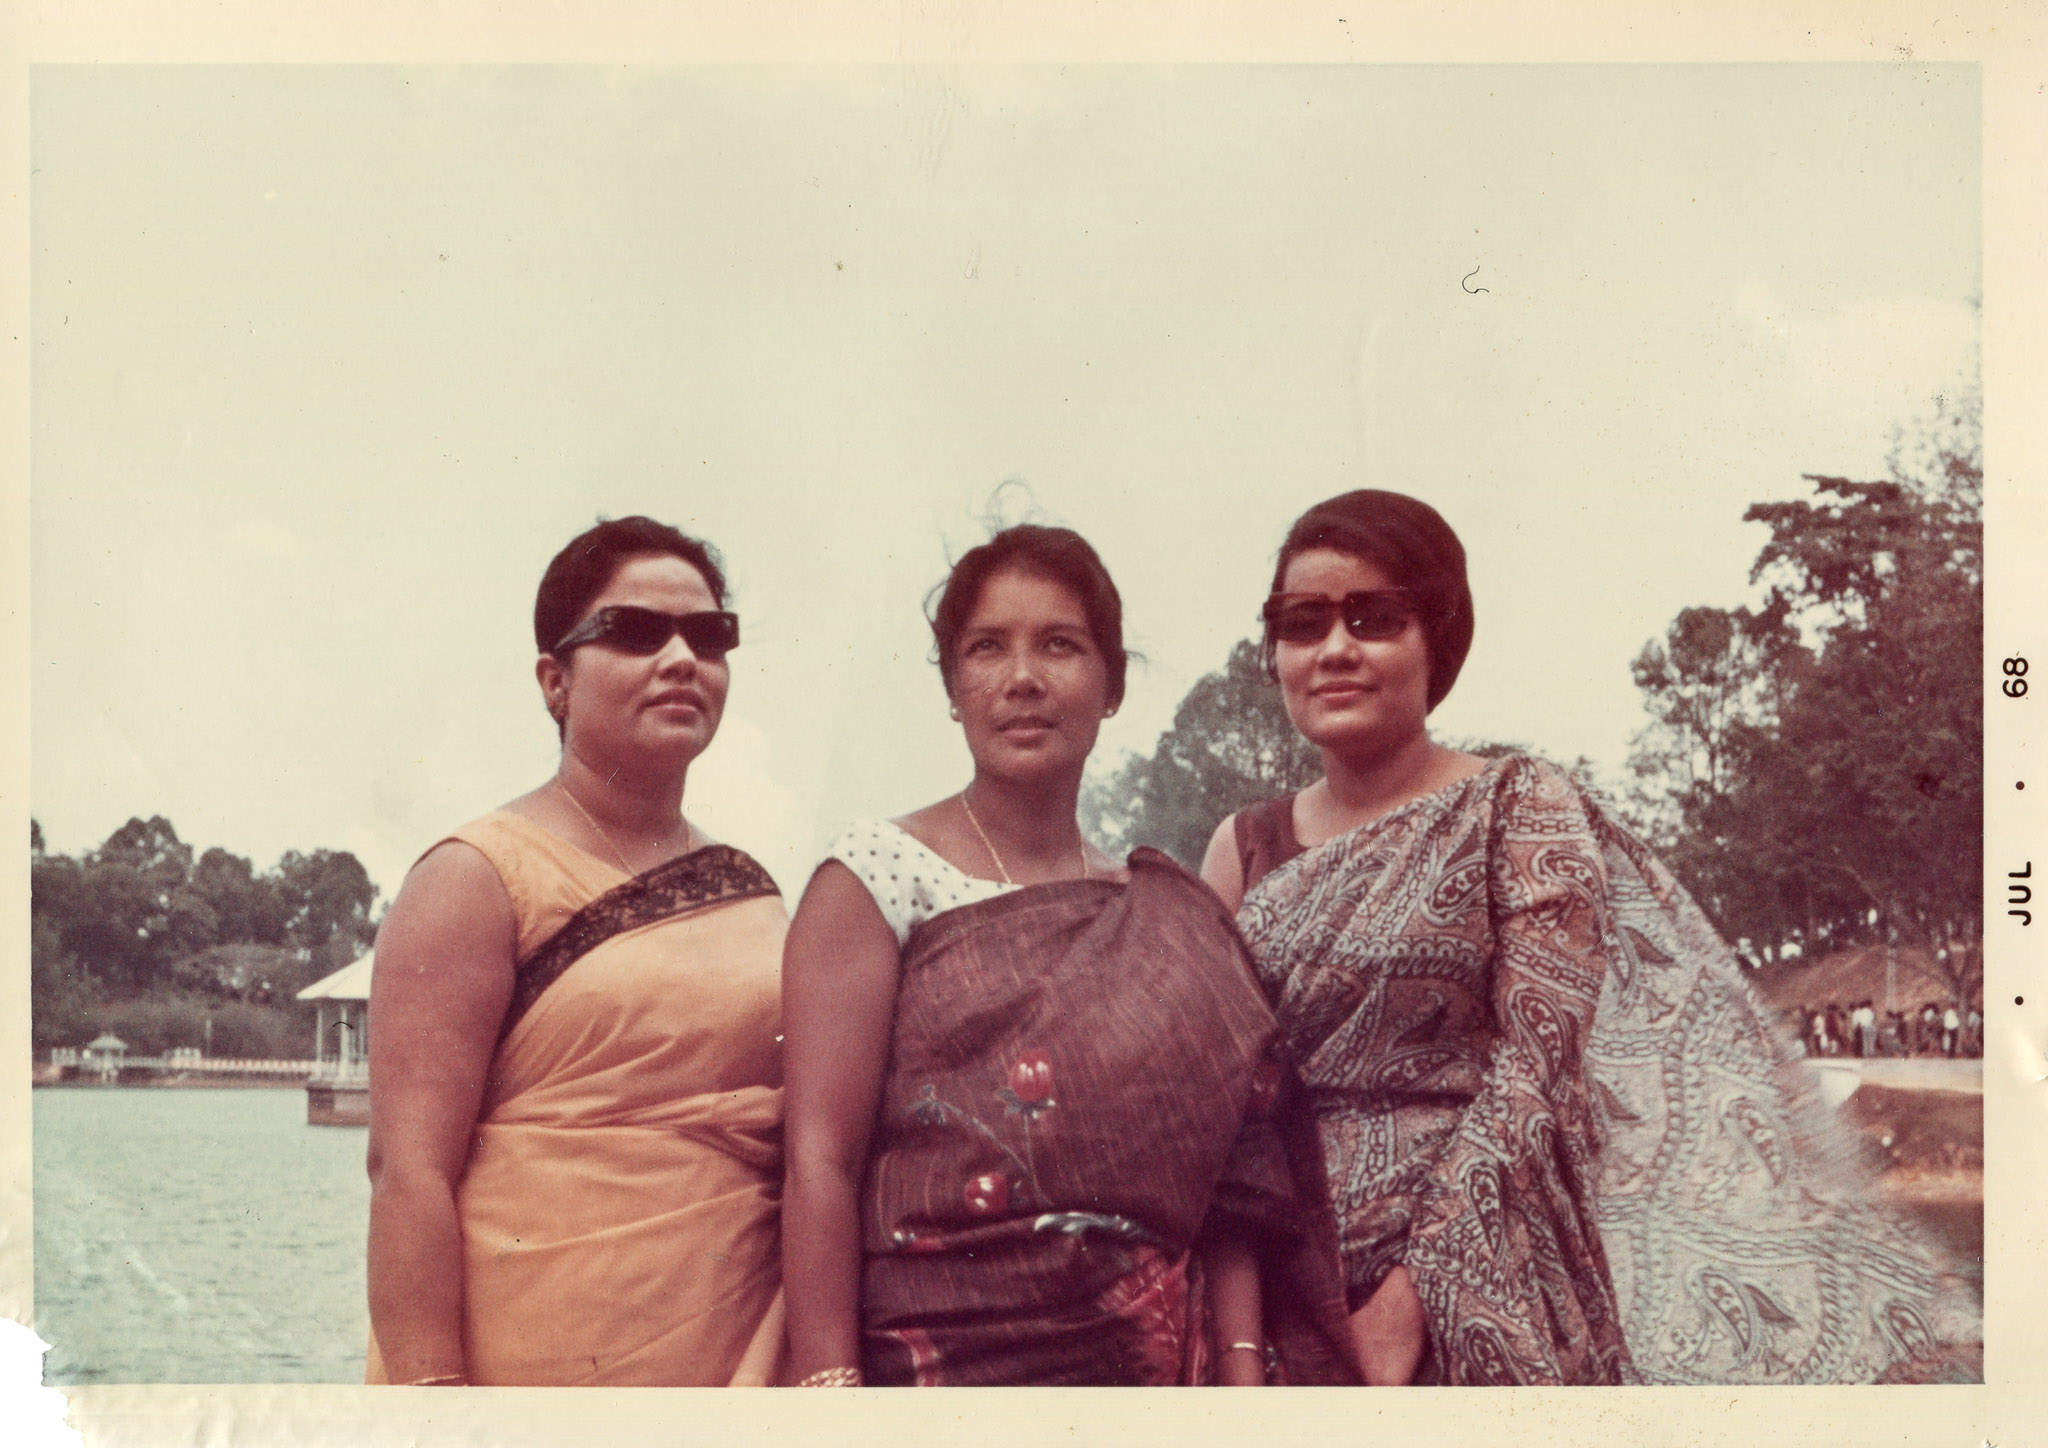 singapore-gurkhas-archive-photo-museum-zakaria-zainal-56.jpg